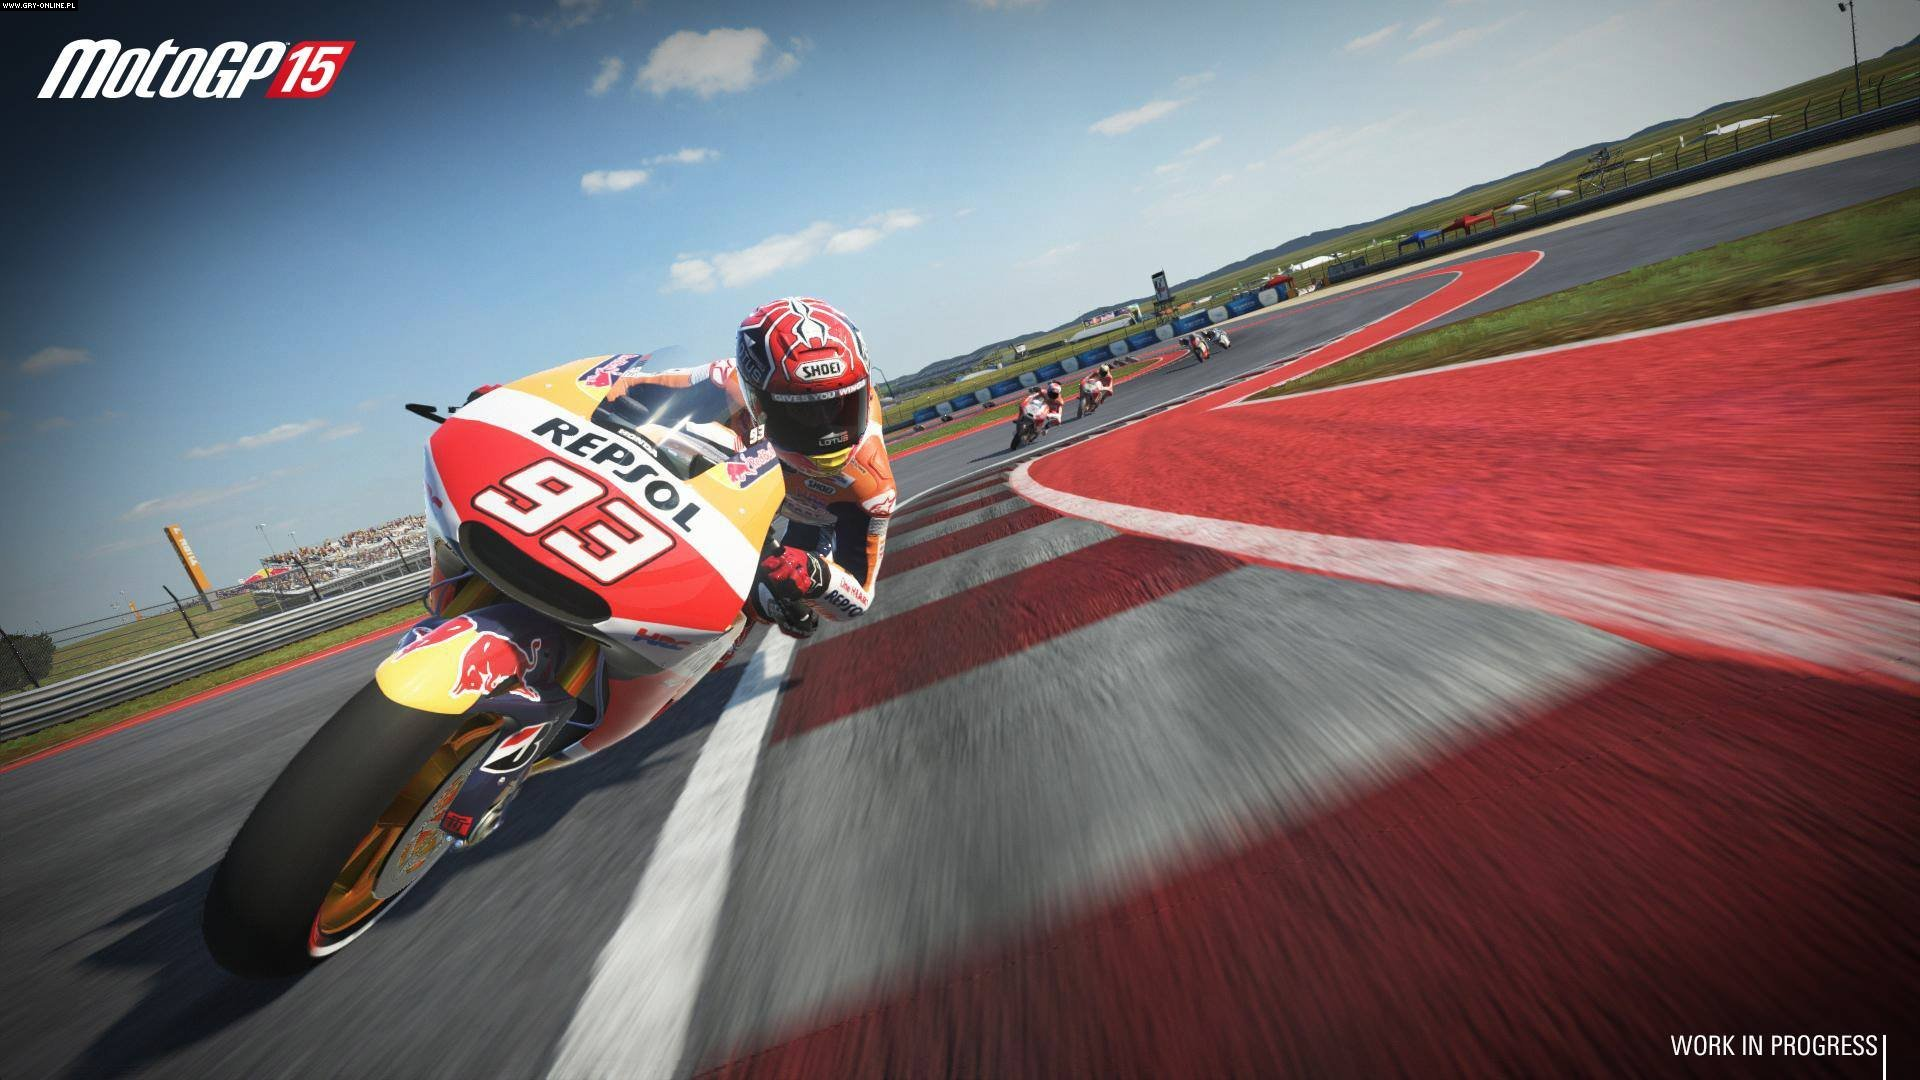 MotoGP 15 - screenshots gallery - screenshot 7/7 - gamepressure.com